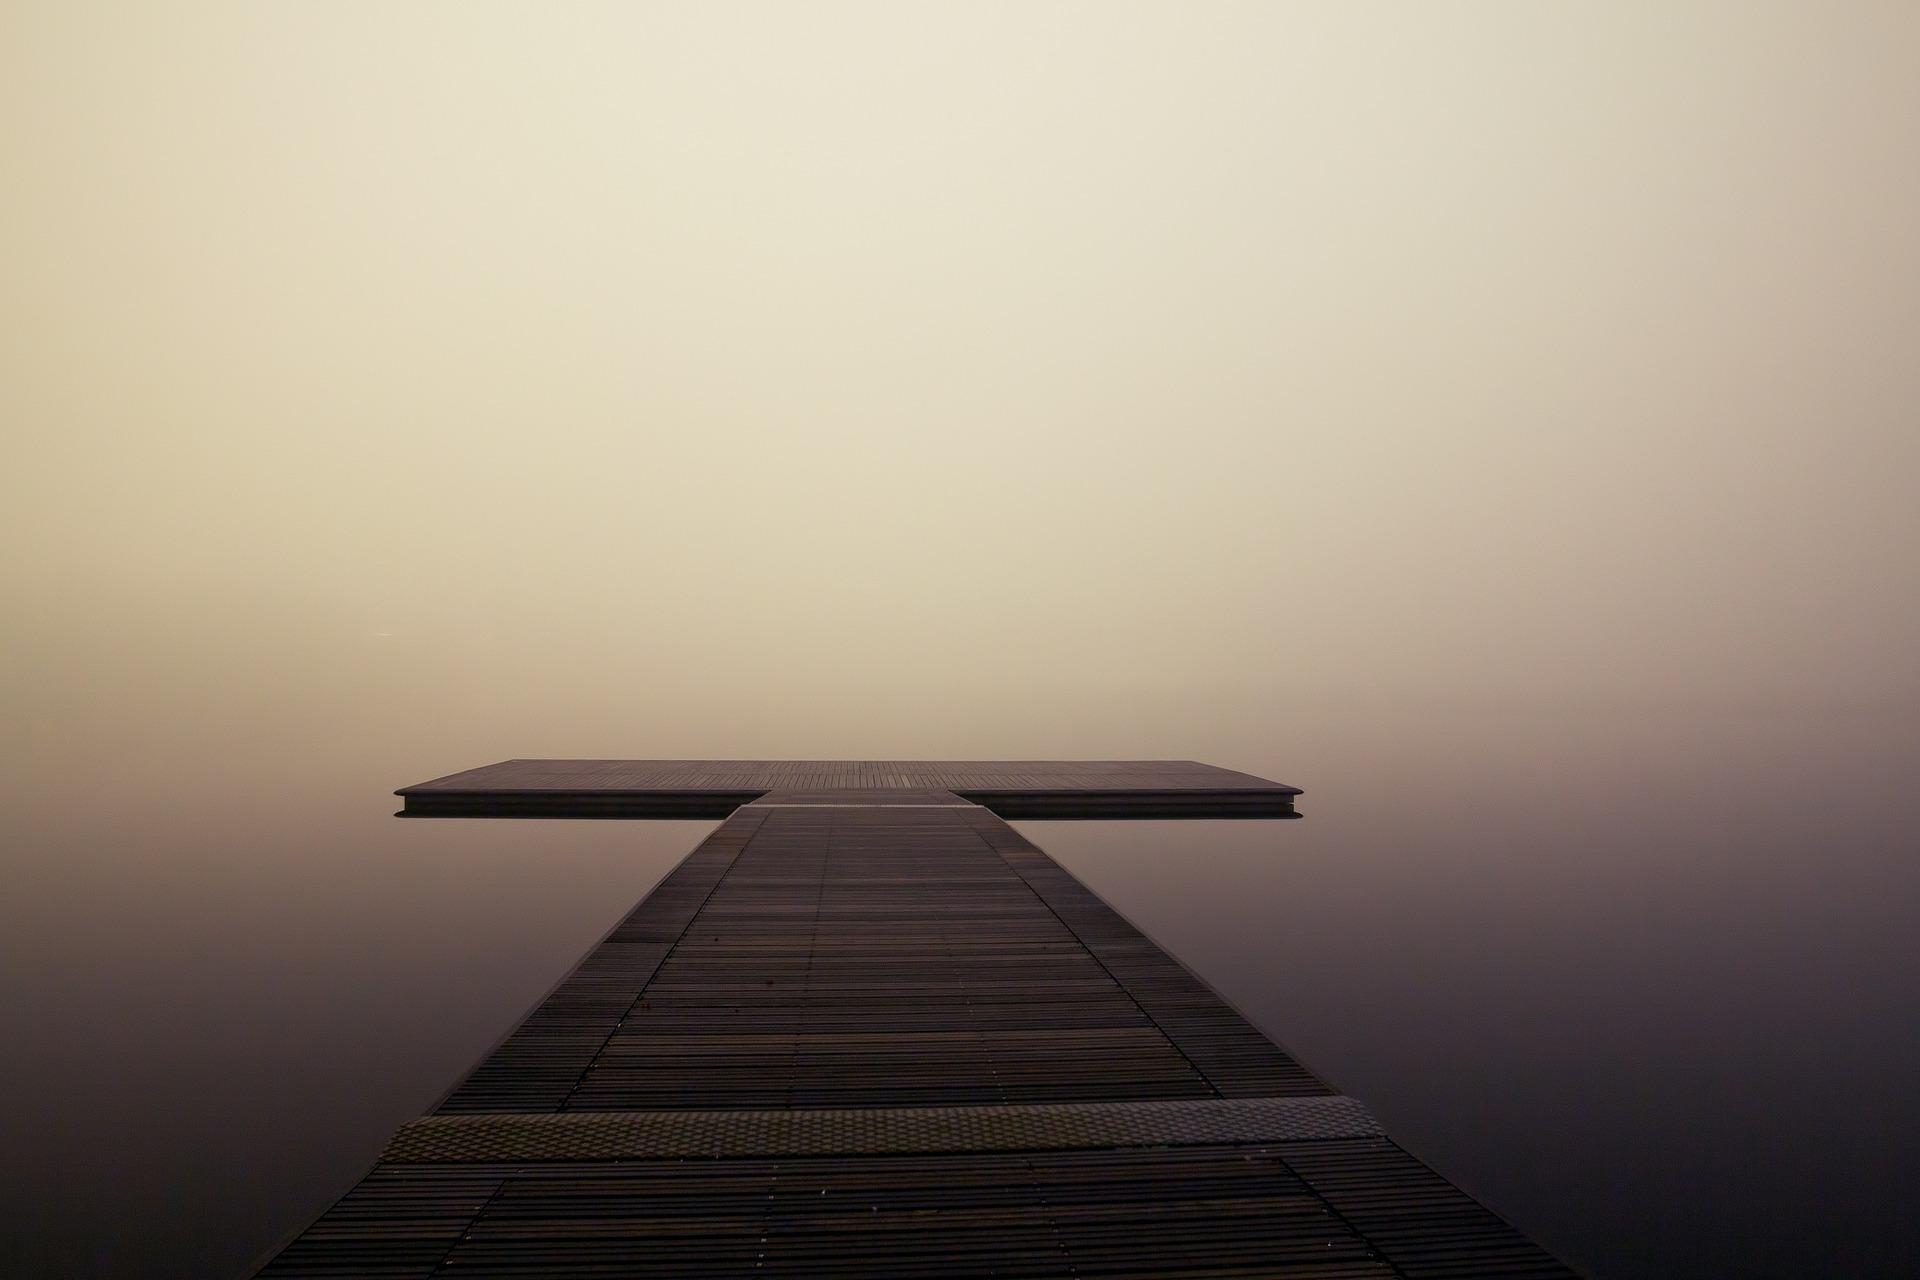 Primavera, madeira, Lago, Calma, Relaxe - Papéis de parede HD - Professor-falken.com